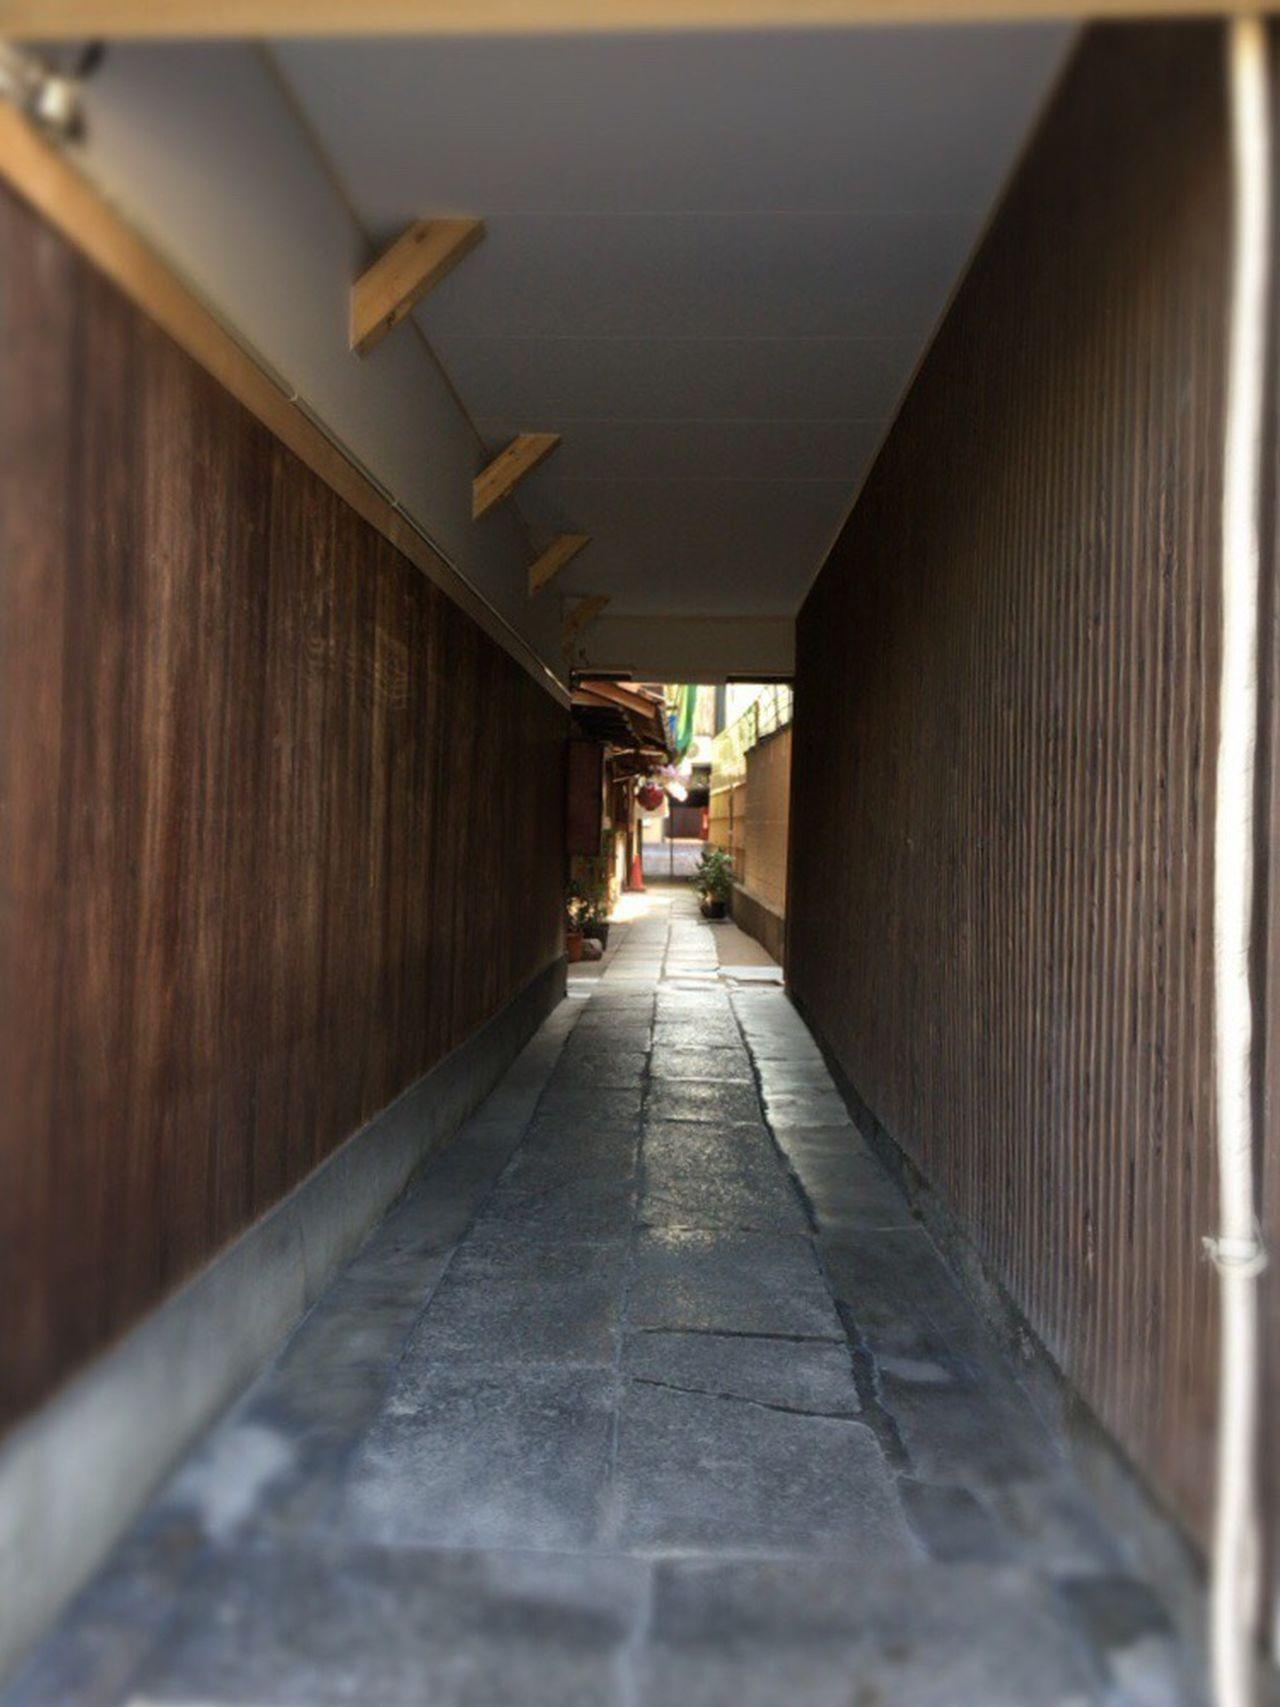 Kyoto Labyrinth Labyrinth Kyoto Street Kyoto,japan Kyoto Street Stray Around Kyoto Street Wandering Wandering Kyoto Matiya Kyoto City Kyoto, Japan Kyoto Fantastic Matiya